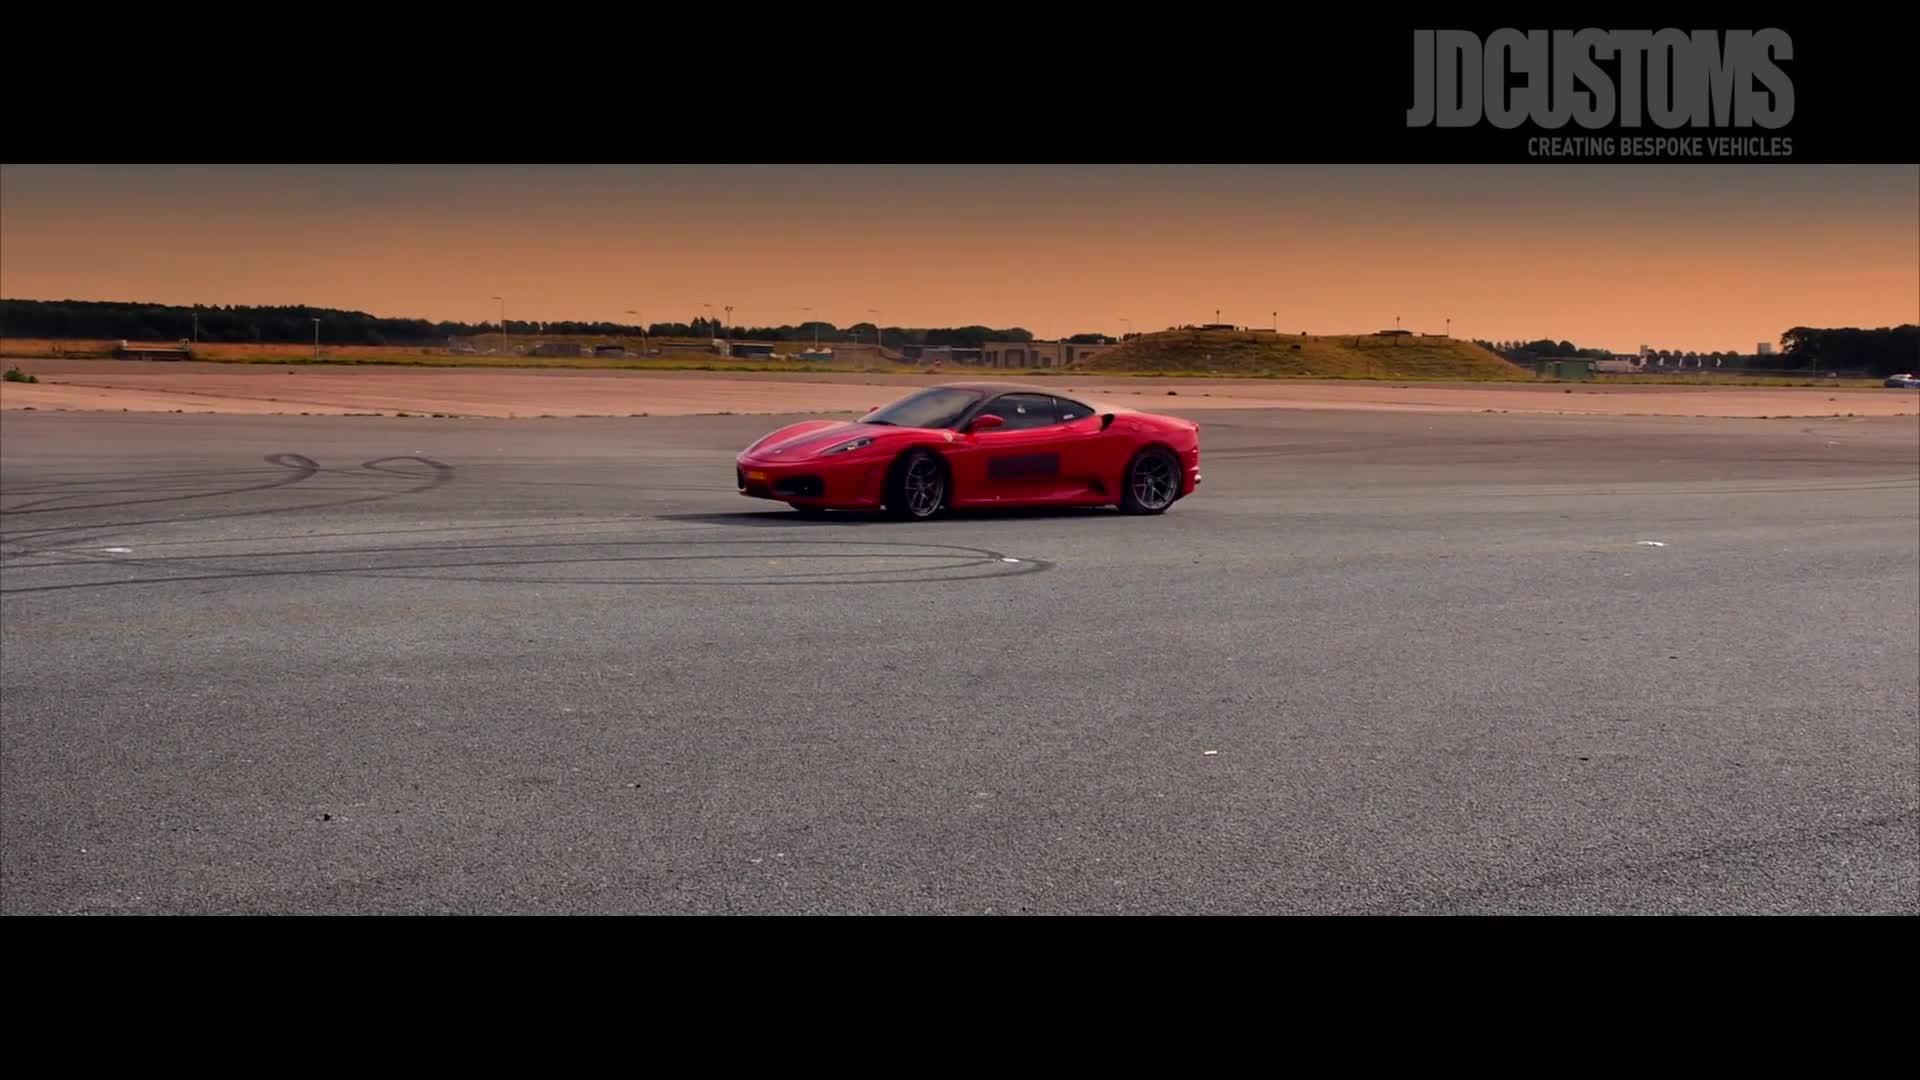 Lamborghini Aventador Dubai Police Video Watch at Y8